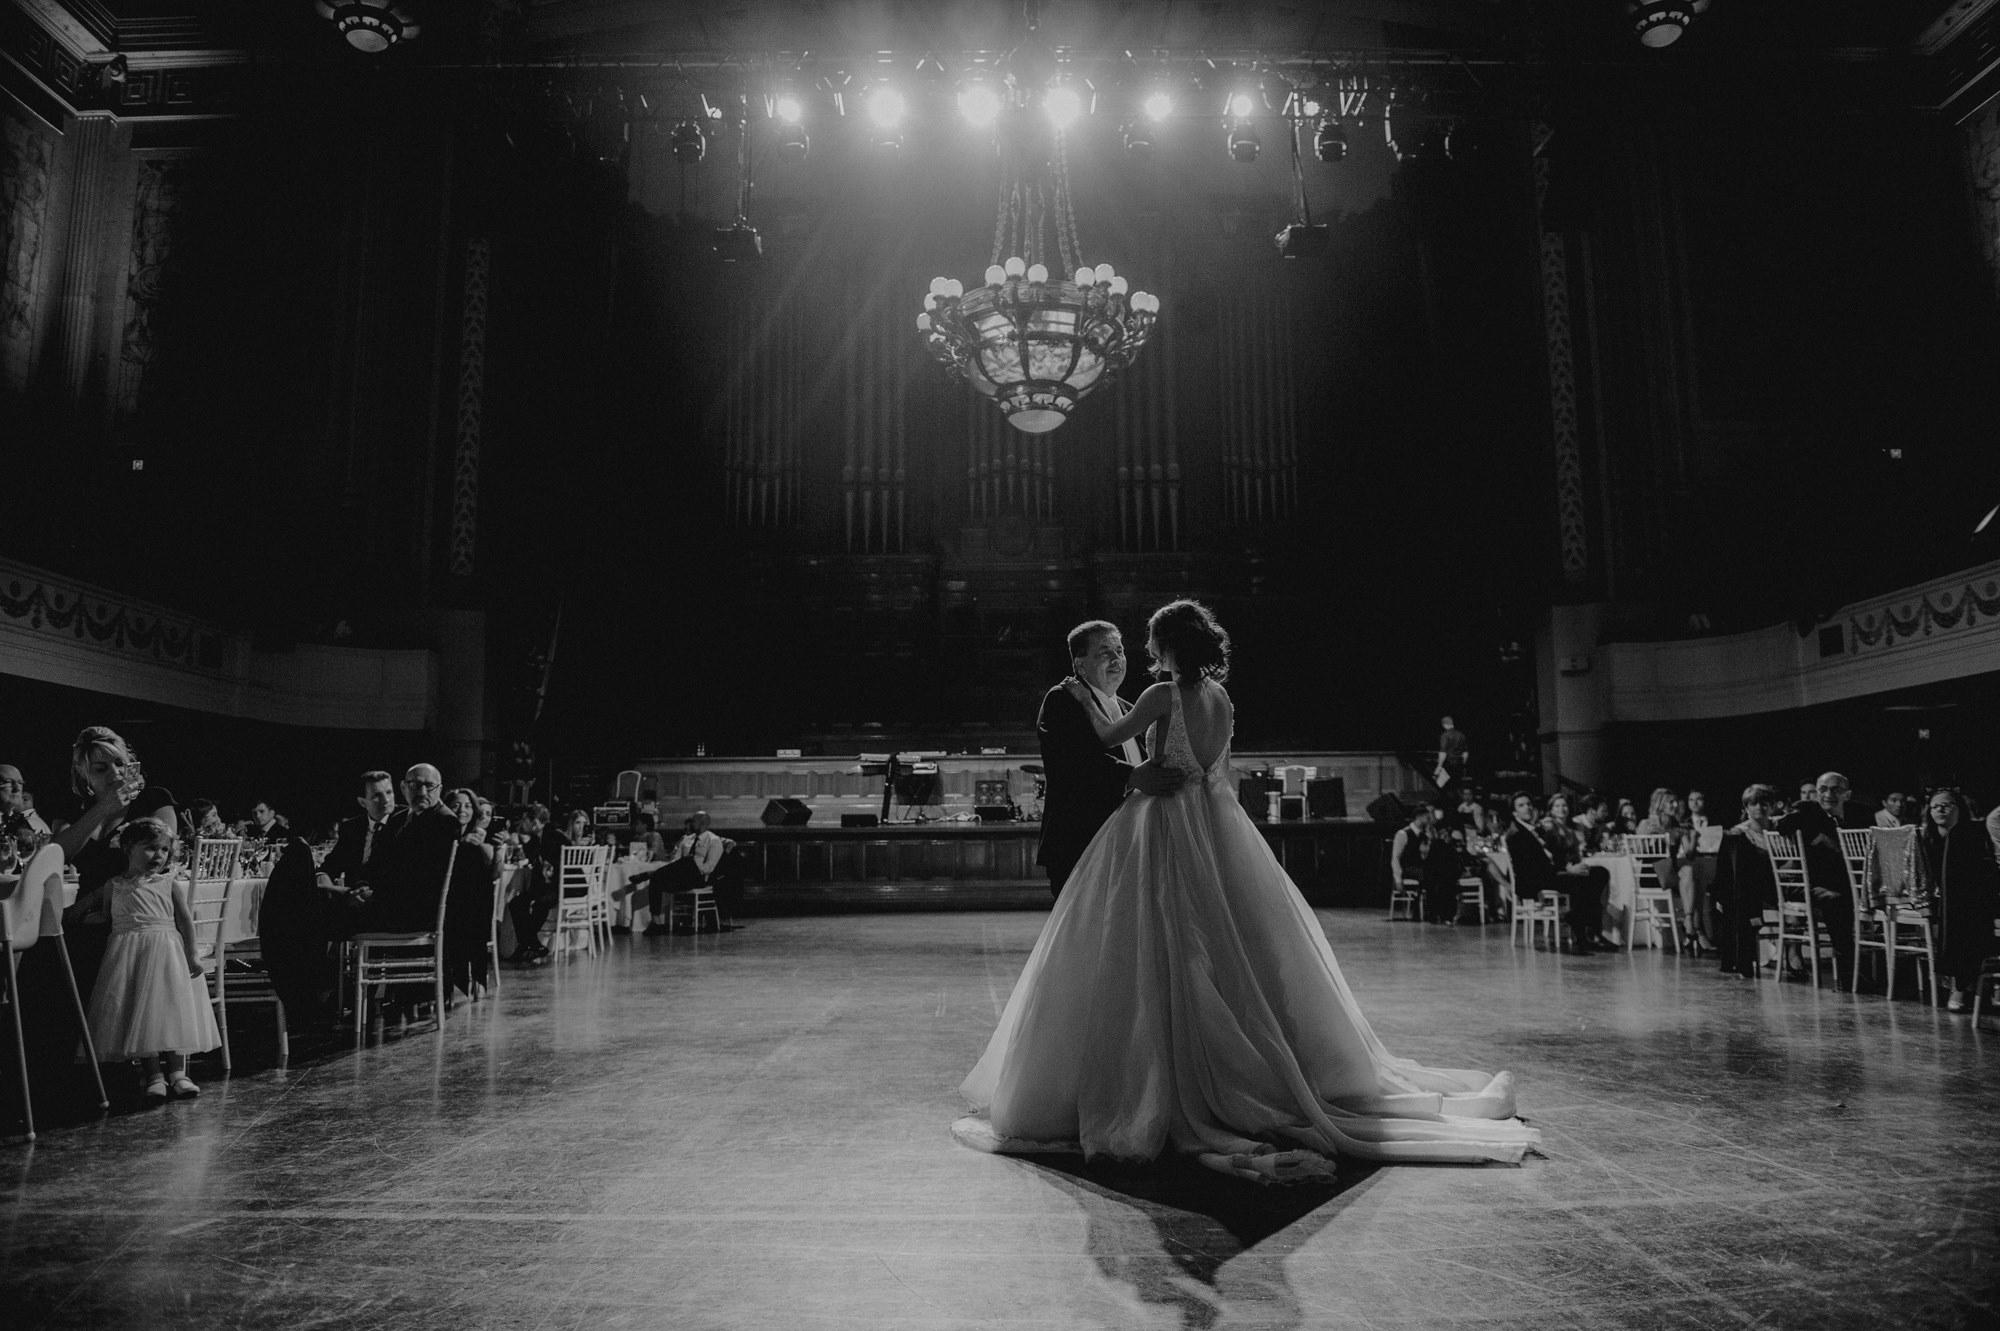 dancing wedding dress.jpg